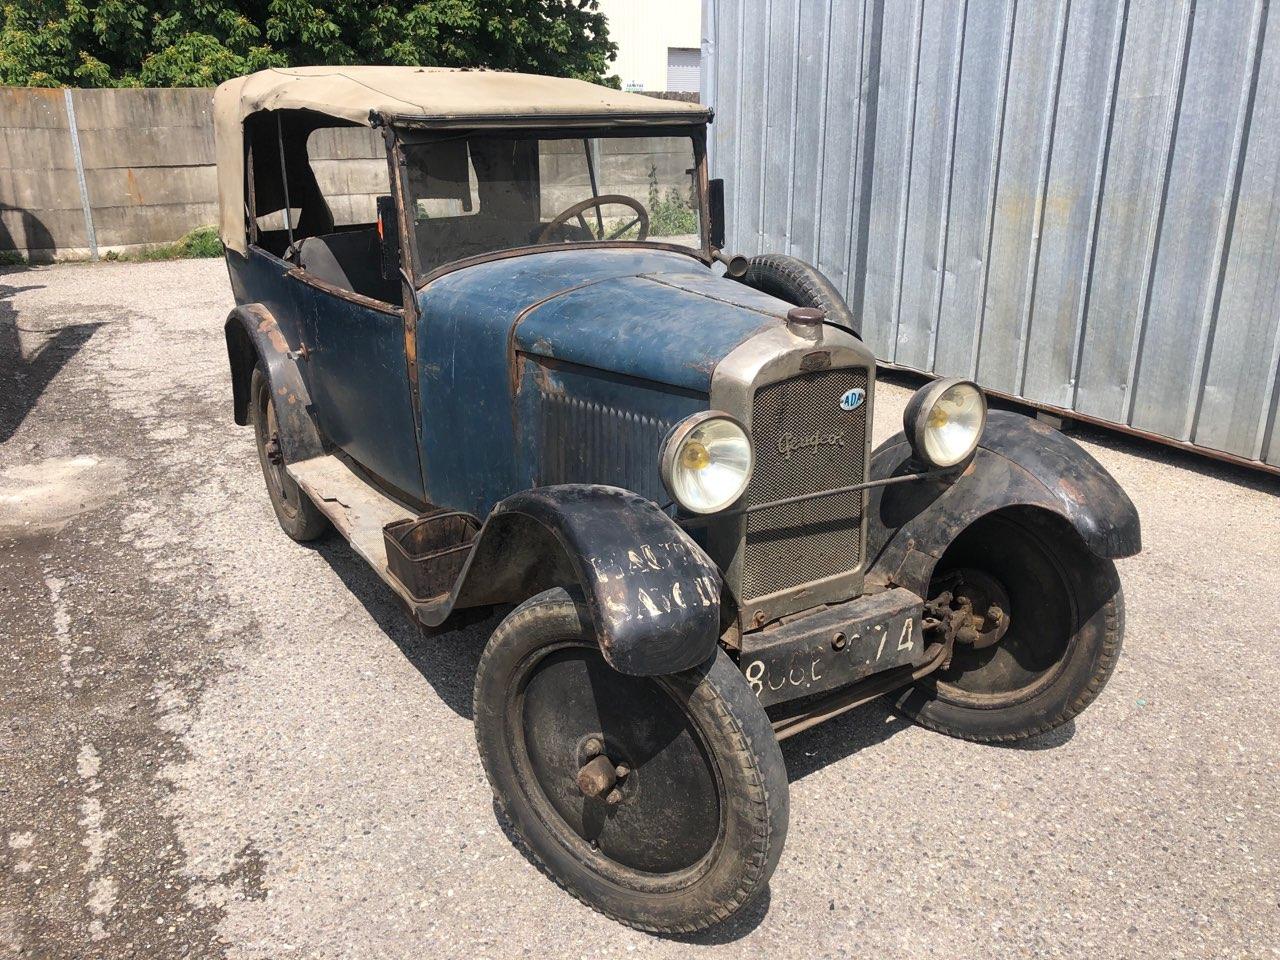 Peugeot 190 S 1928 Jean Jacques V